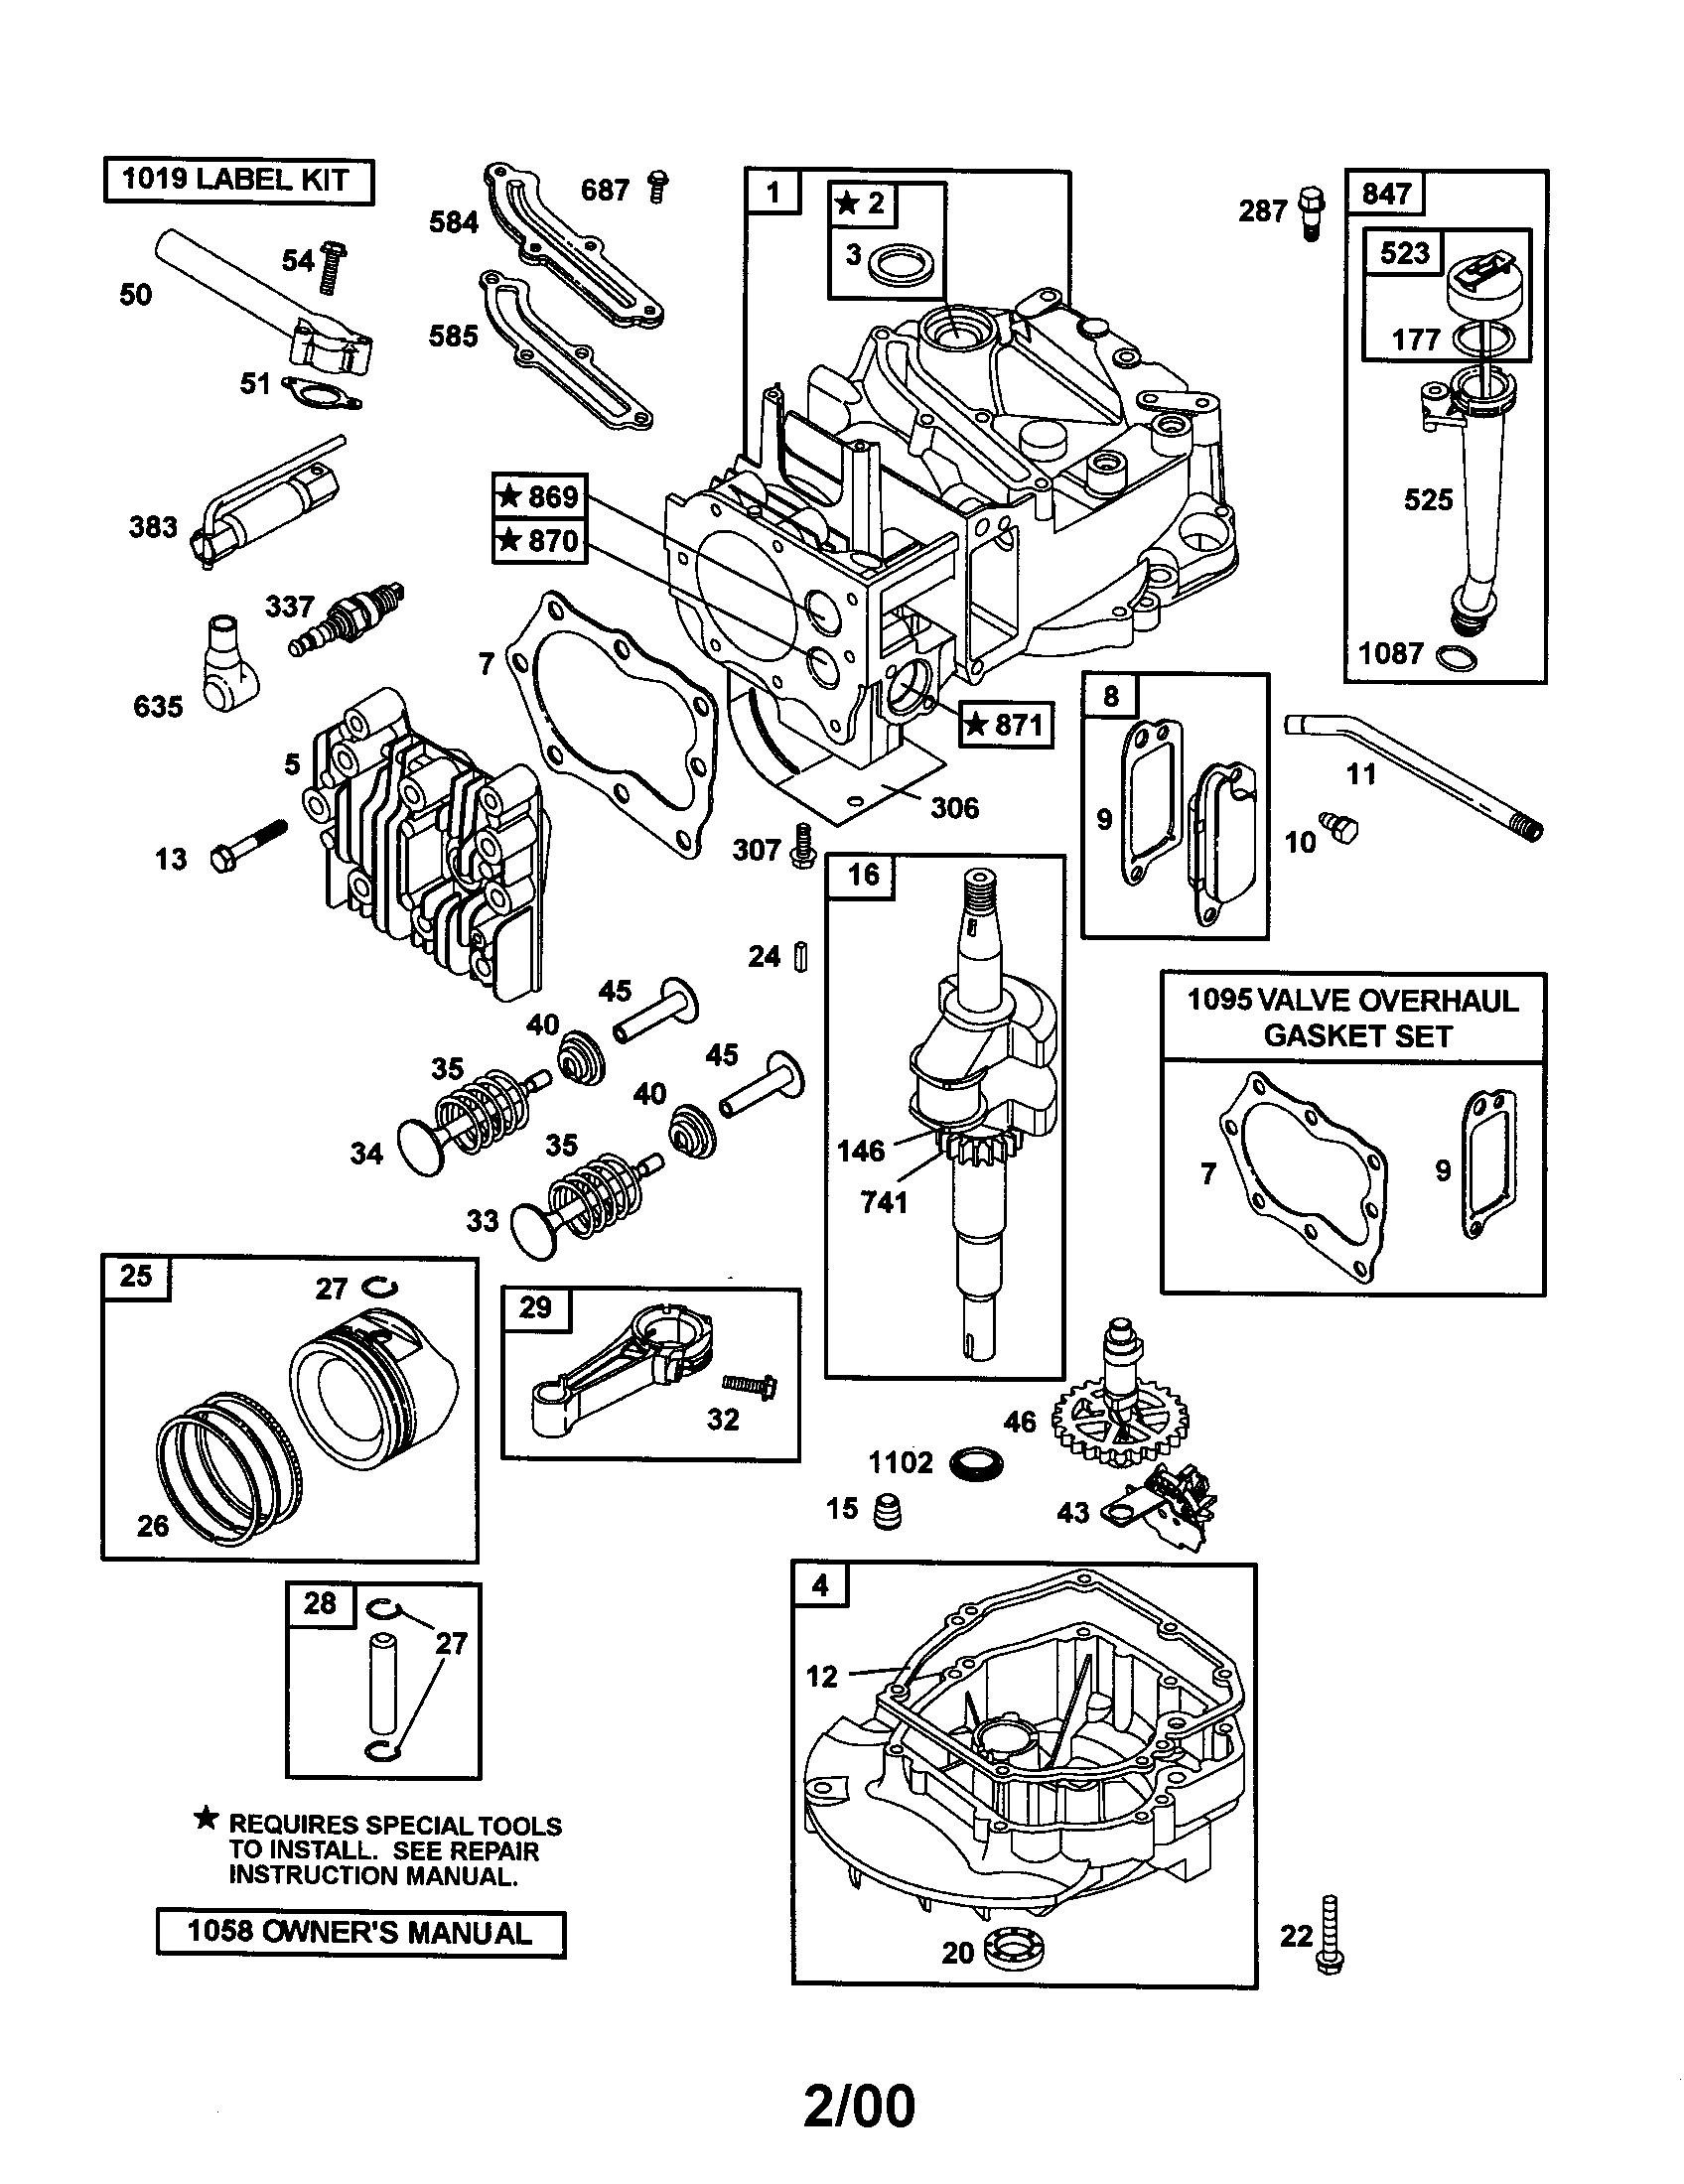 8hp Briggs Engine Diagram And Stratton Schematics Parts Detoxicrecenze Com 1696x2200